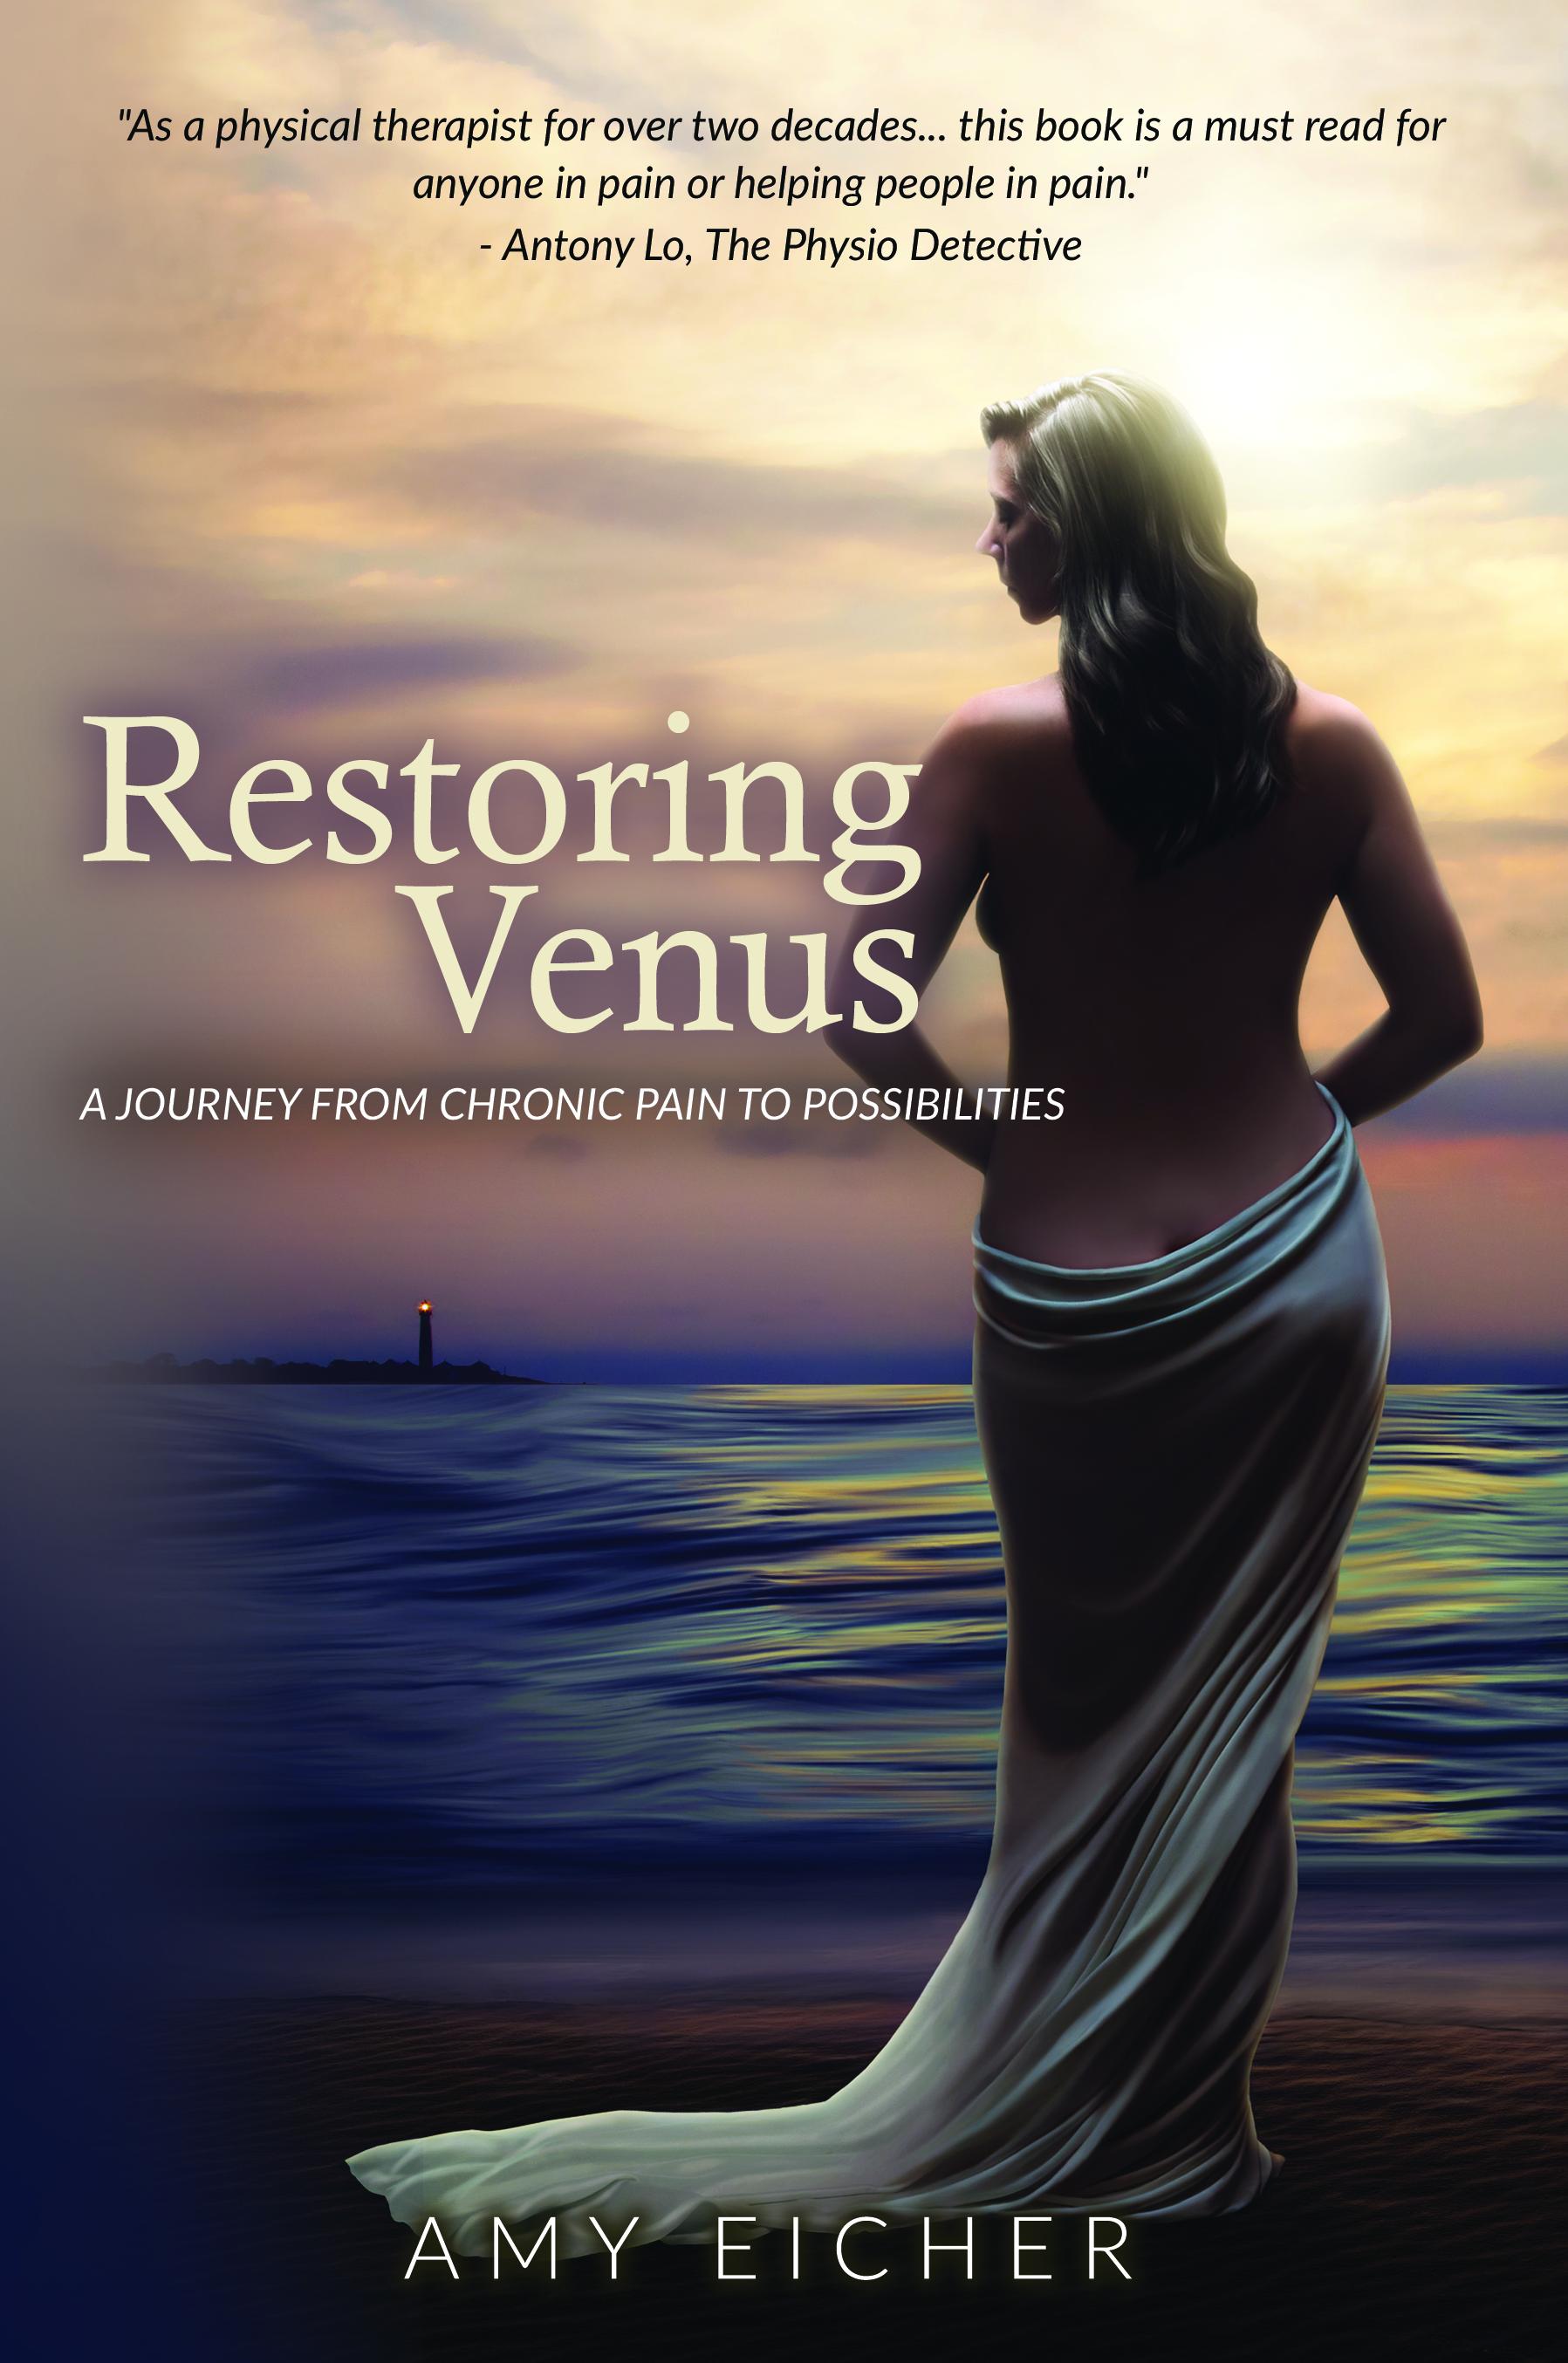 Restoring Venus